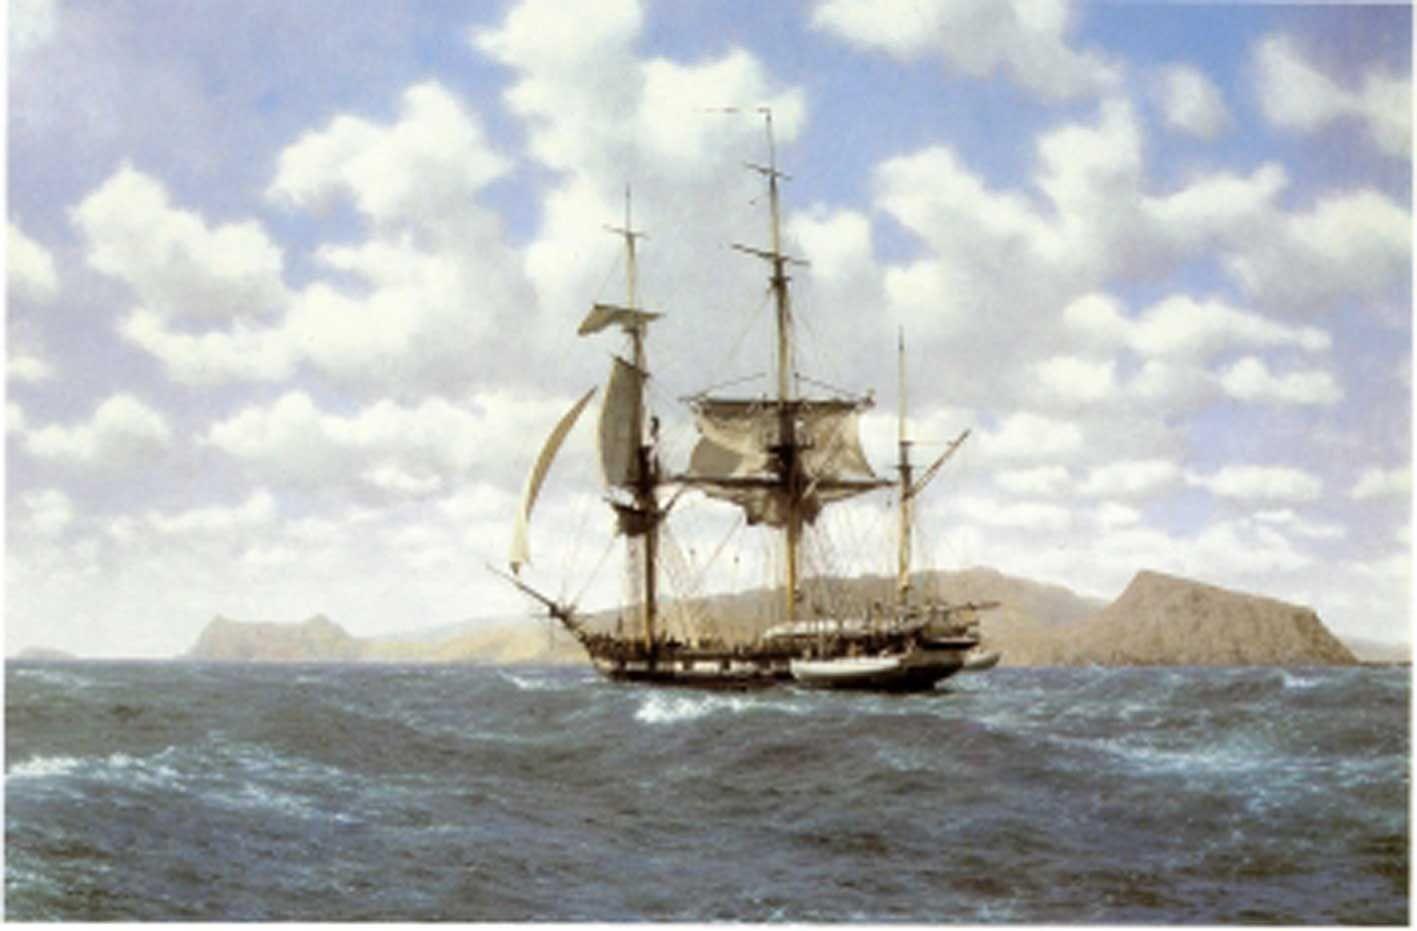 Hms Beagle In The Galapagos 17th October 1835 By John Chancellor